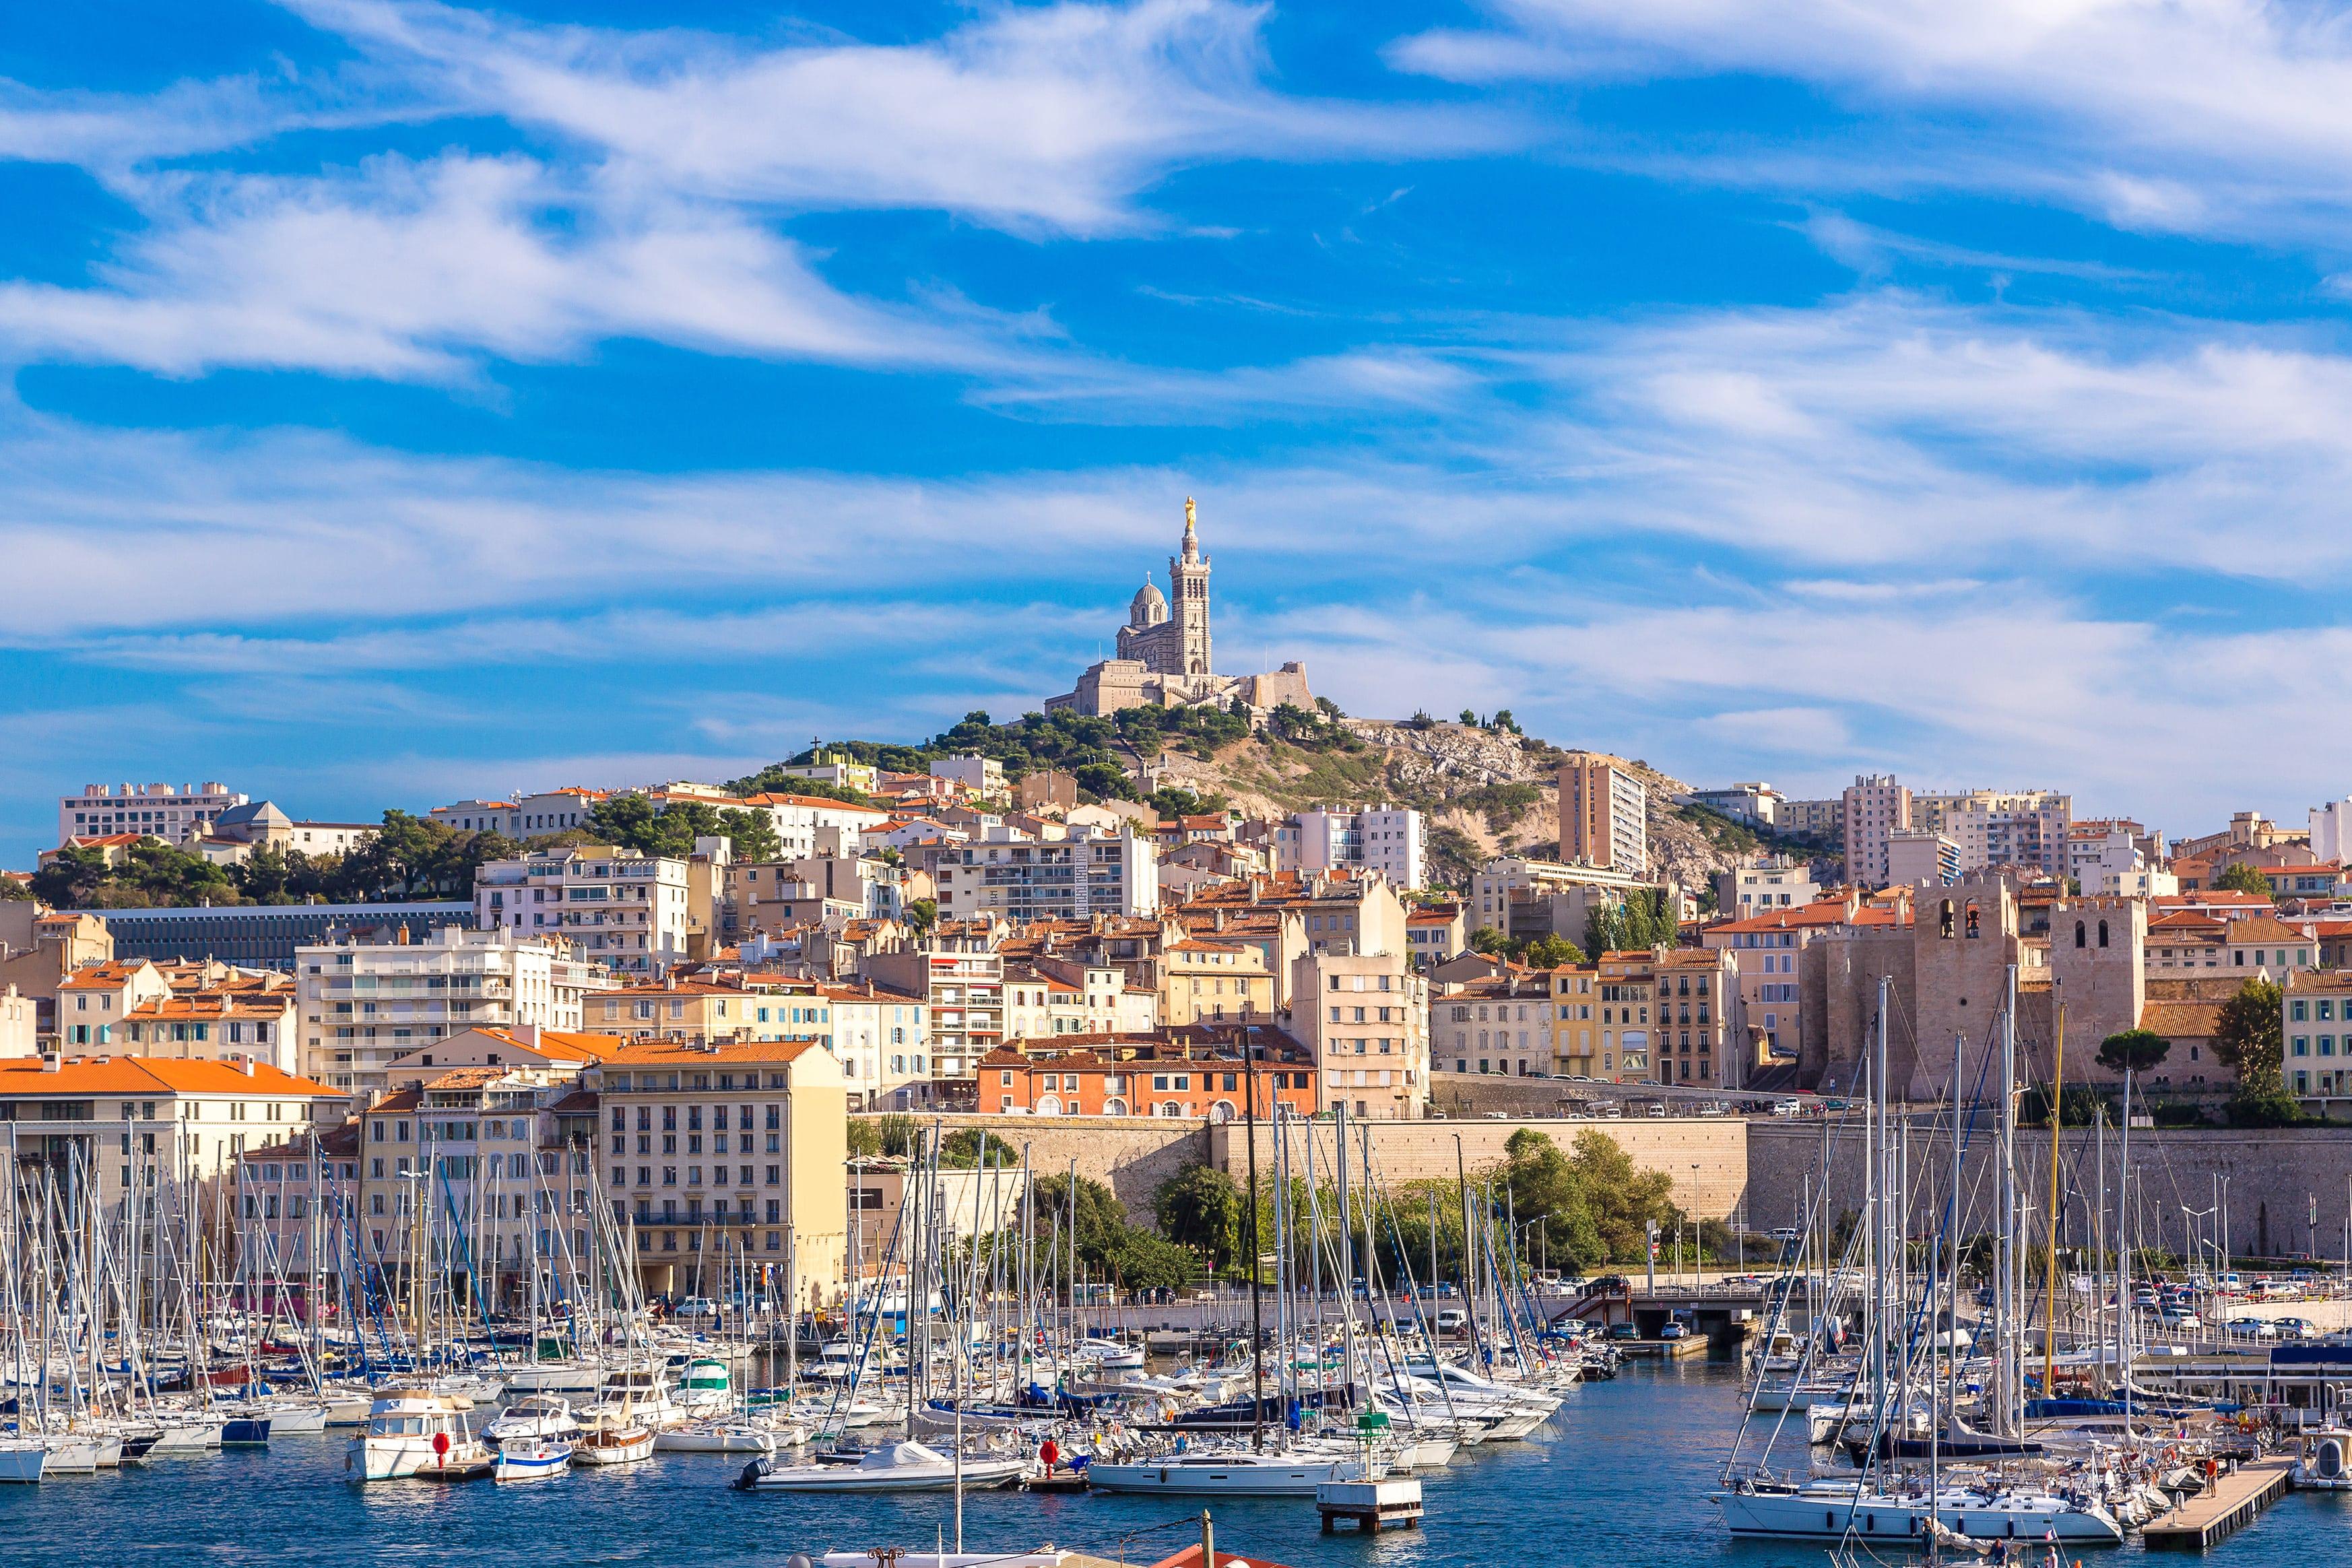 Marseille_France_Notre Dame de la Garde and olf port in Marseille, France_94726032-min